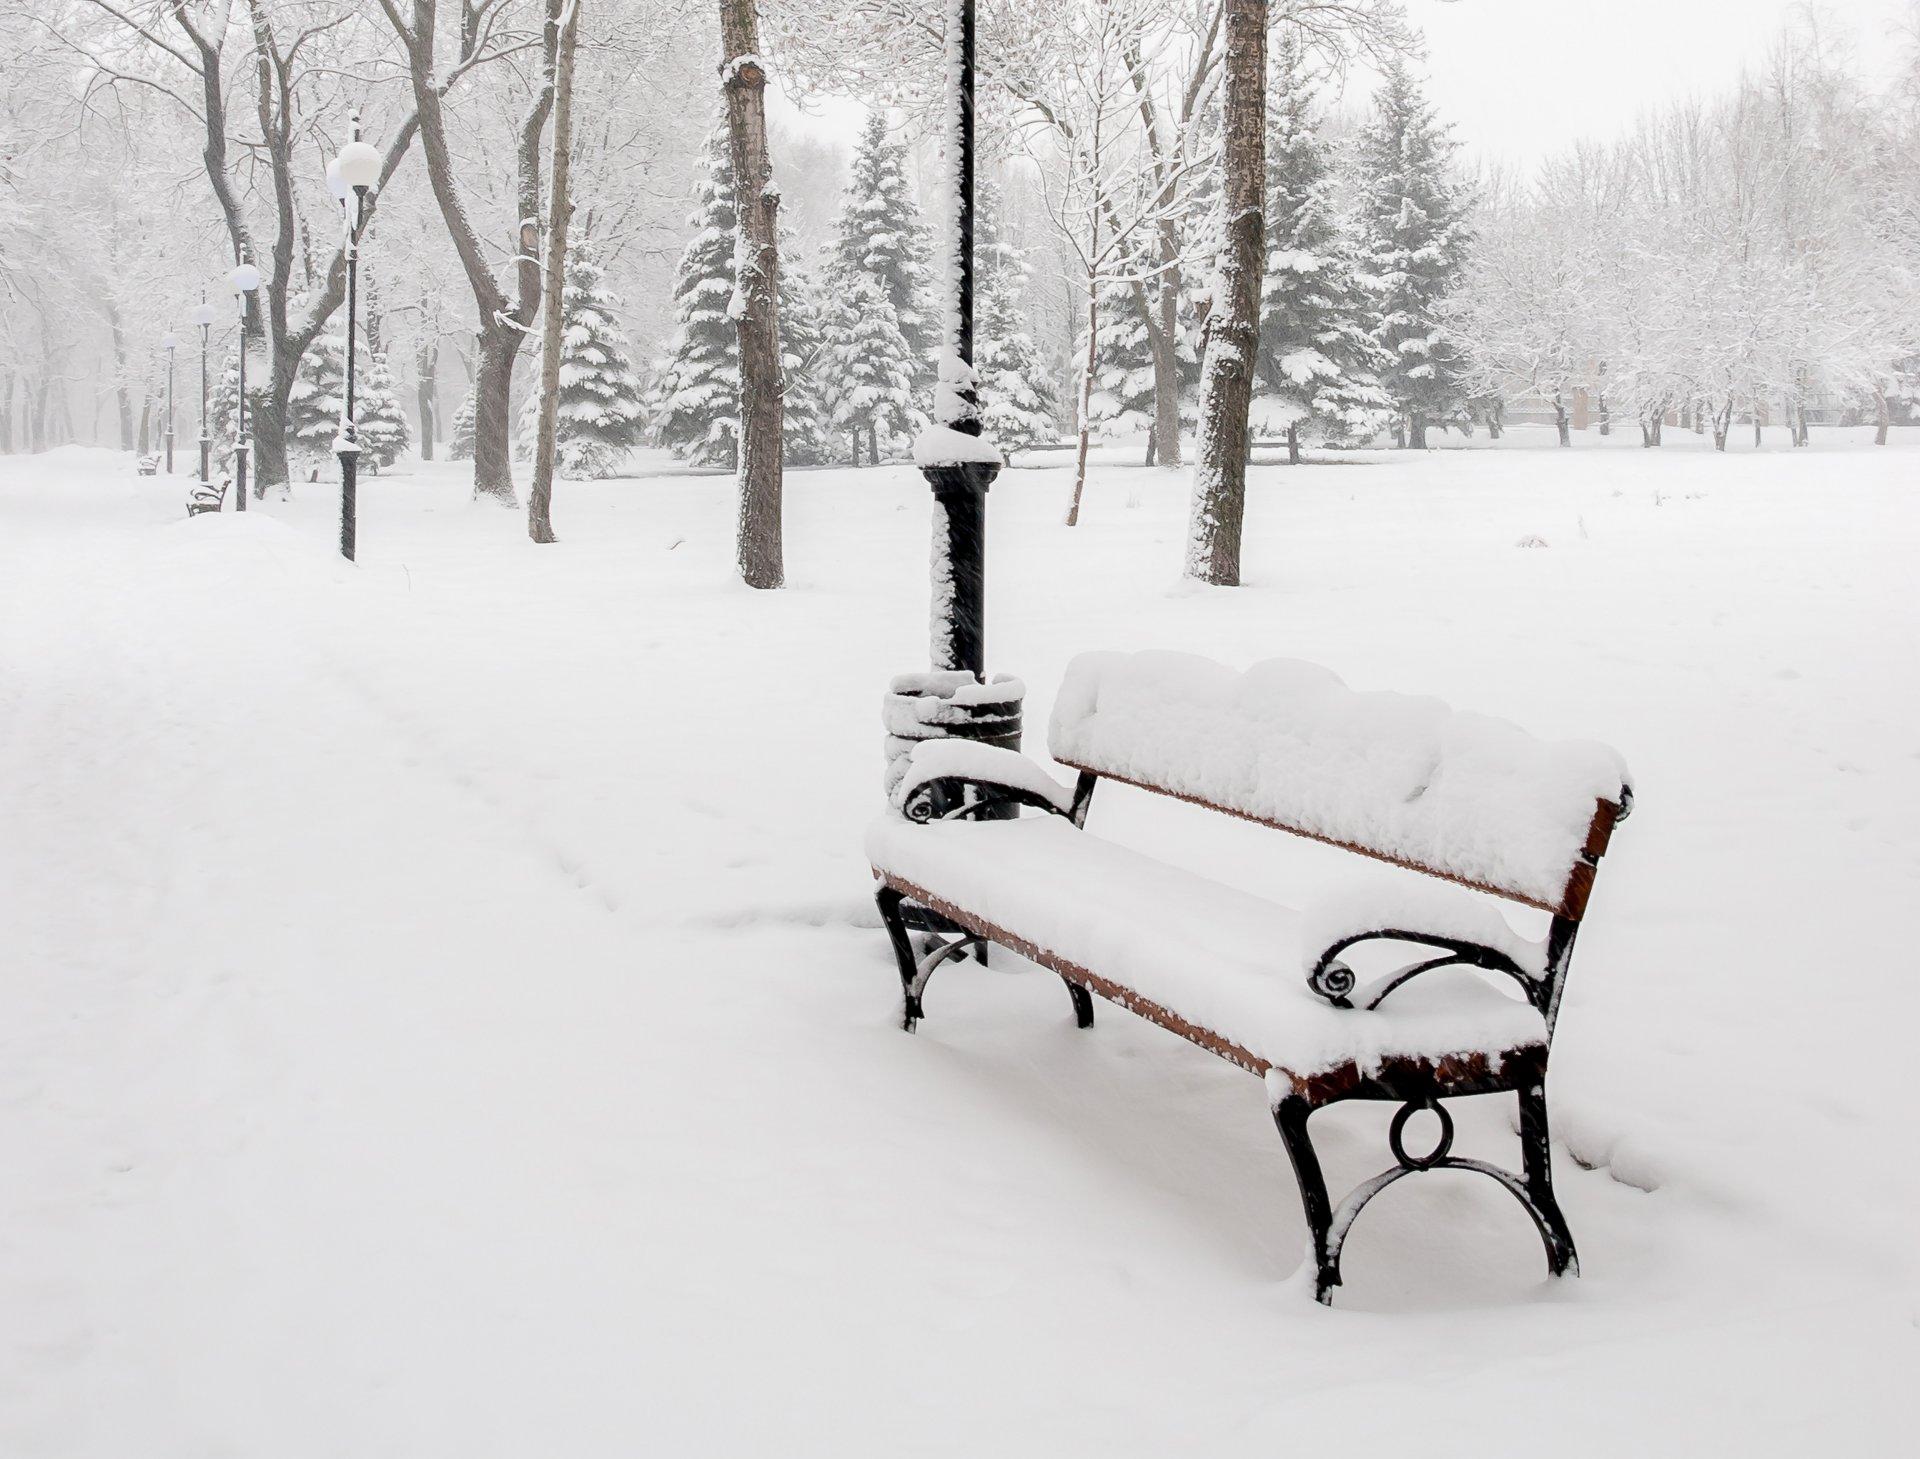 фото скамейка зимой названием ботинки чукка